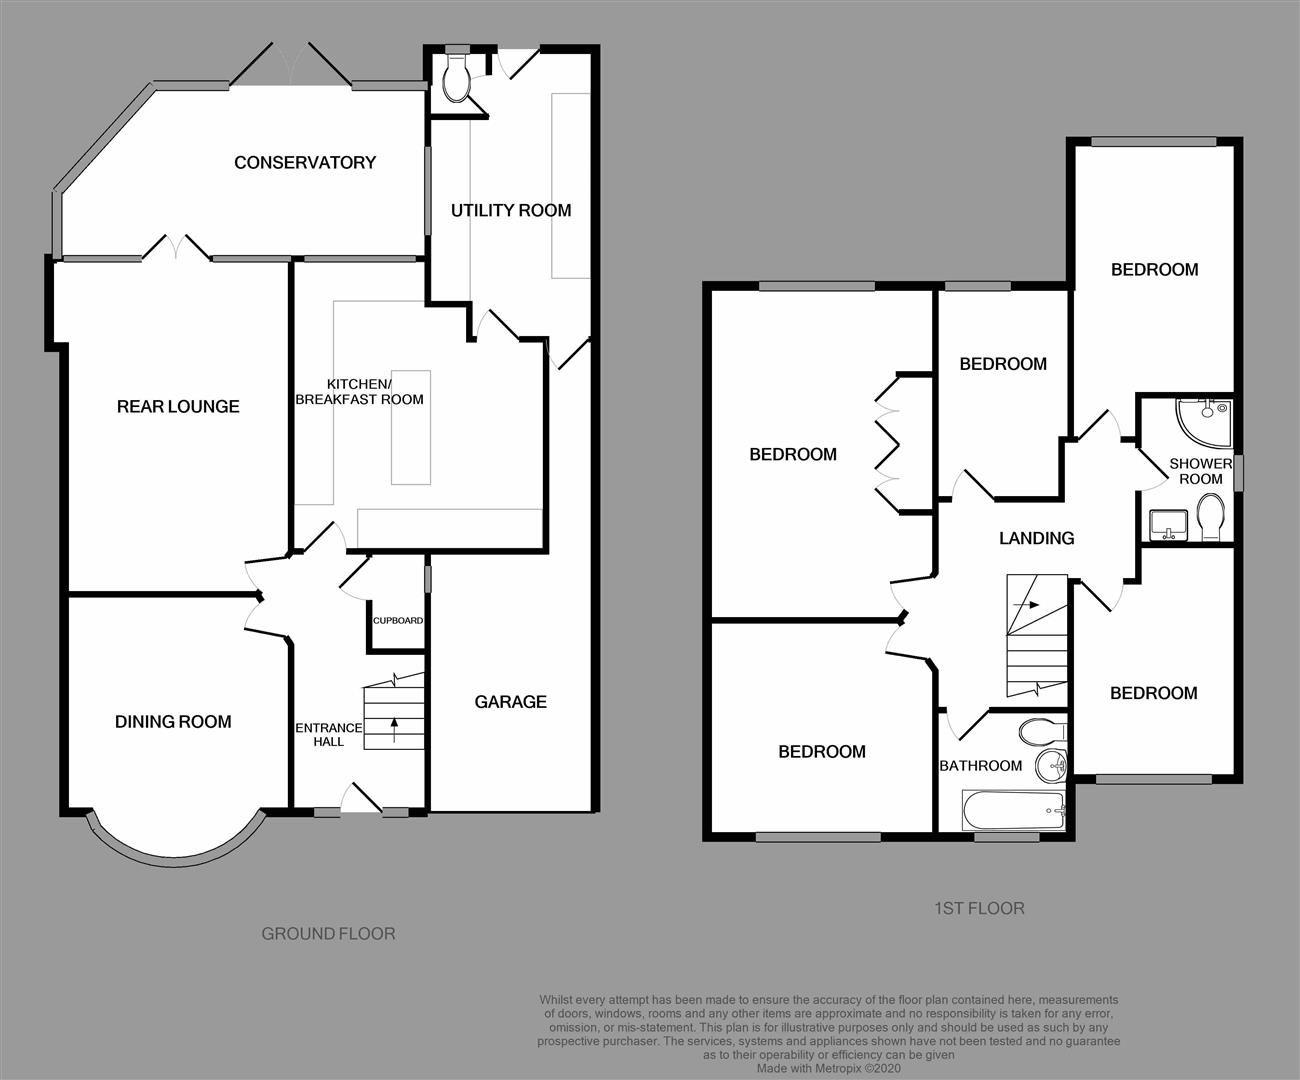 5 bed semi-detached for sale - Property Floorplan